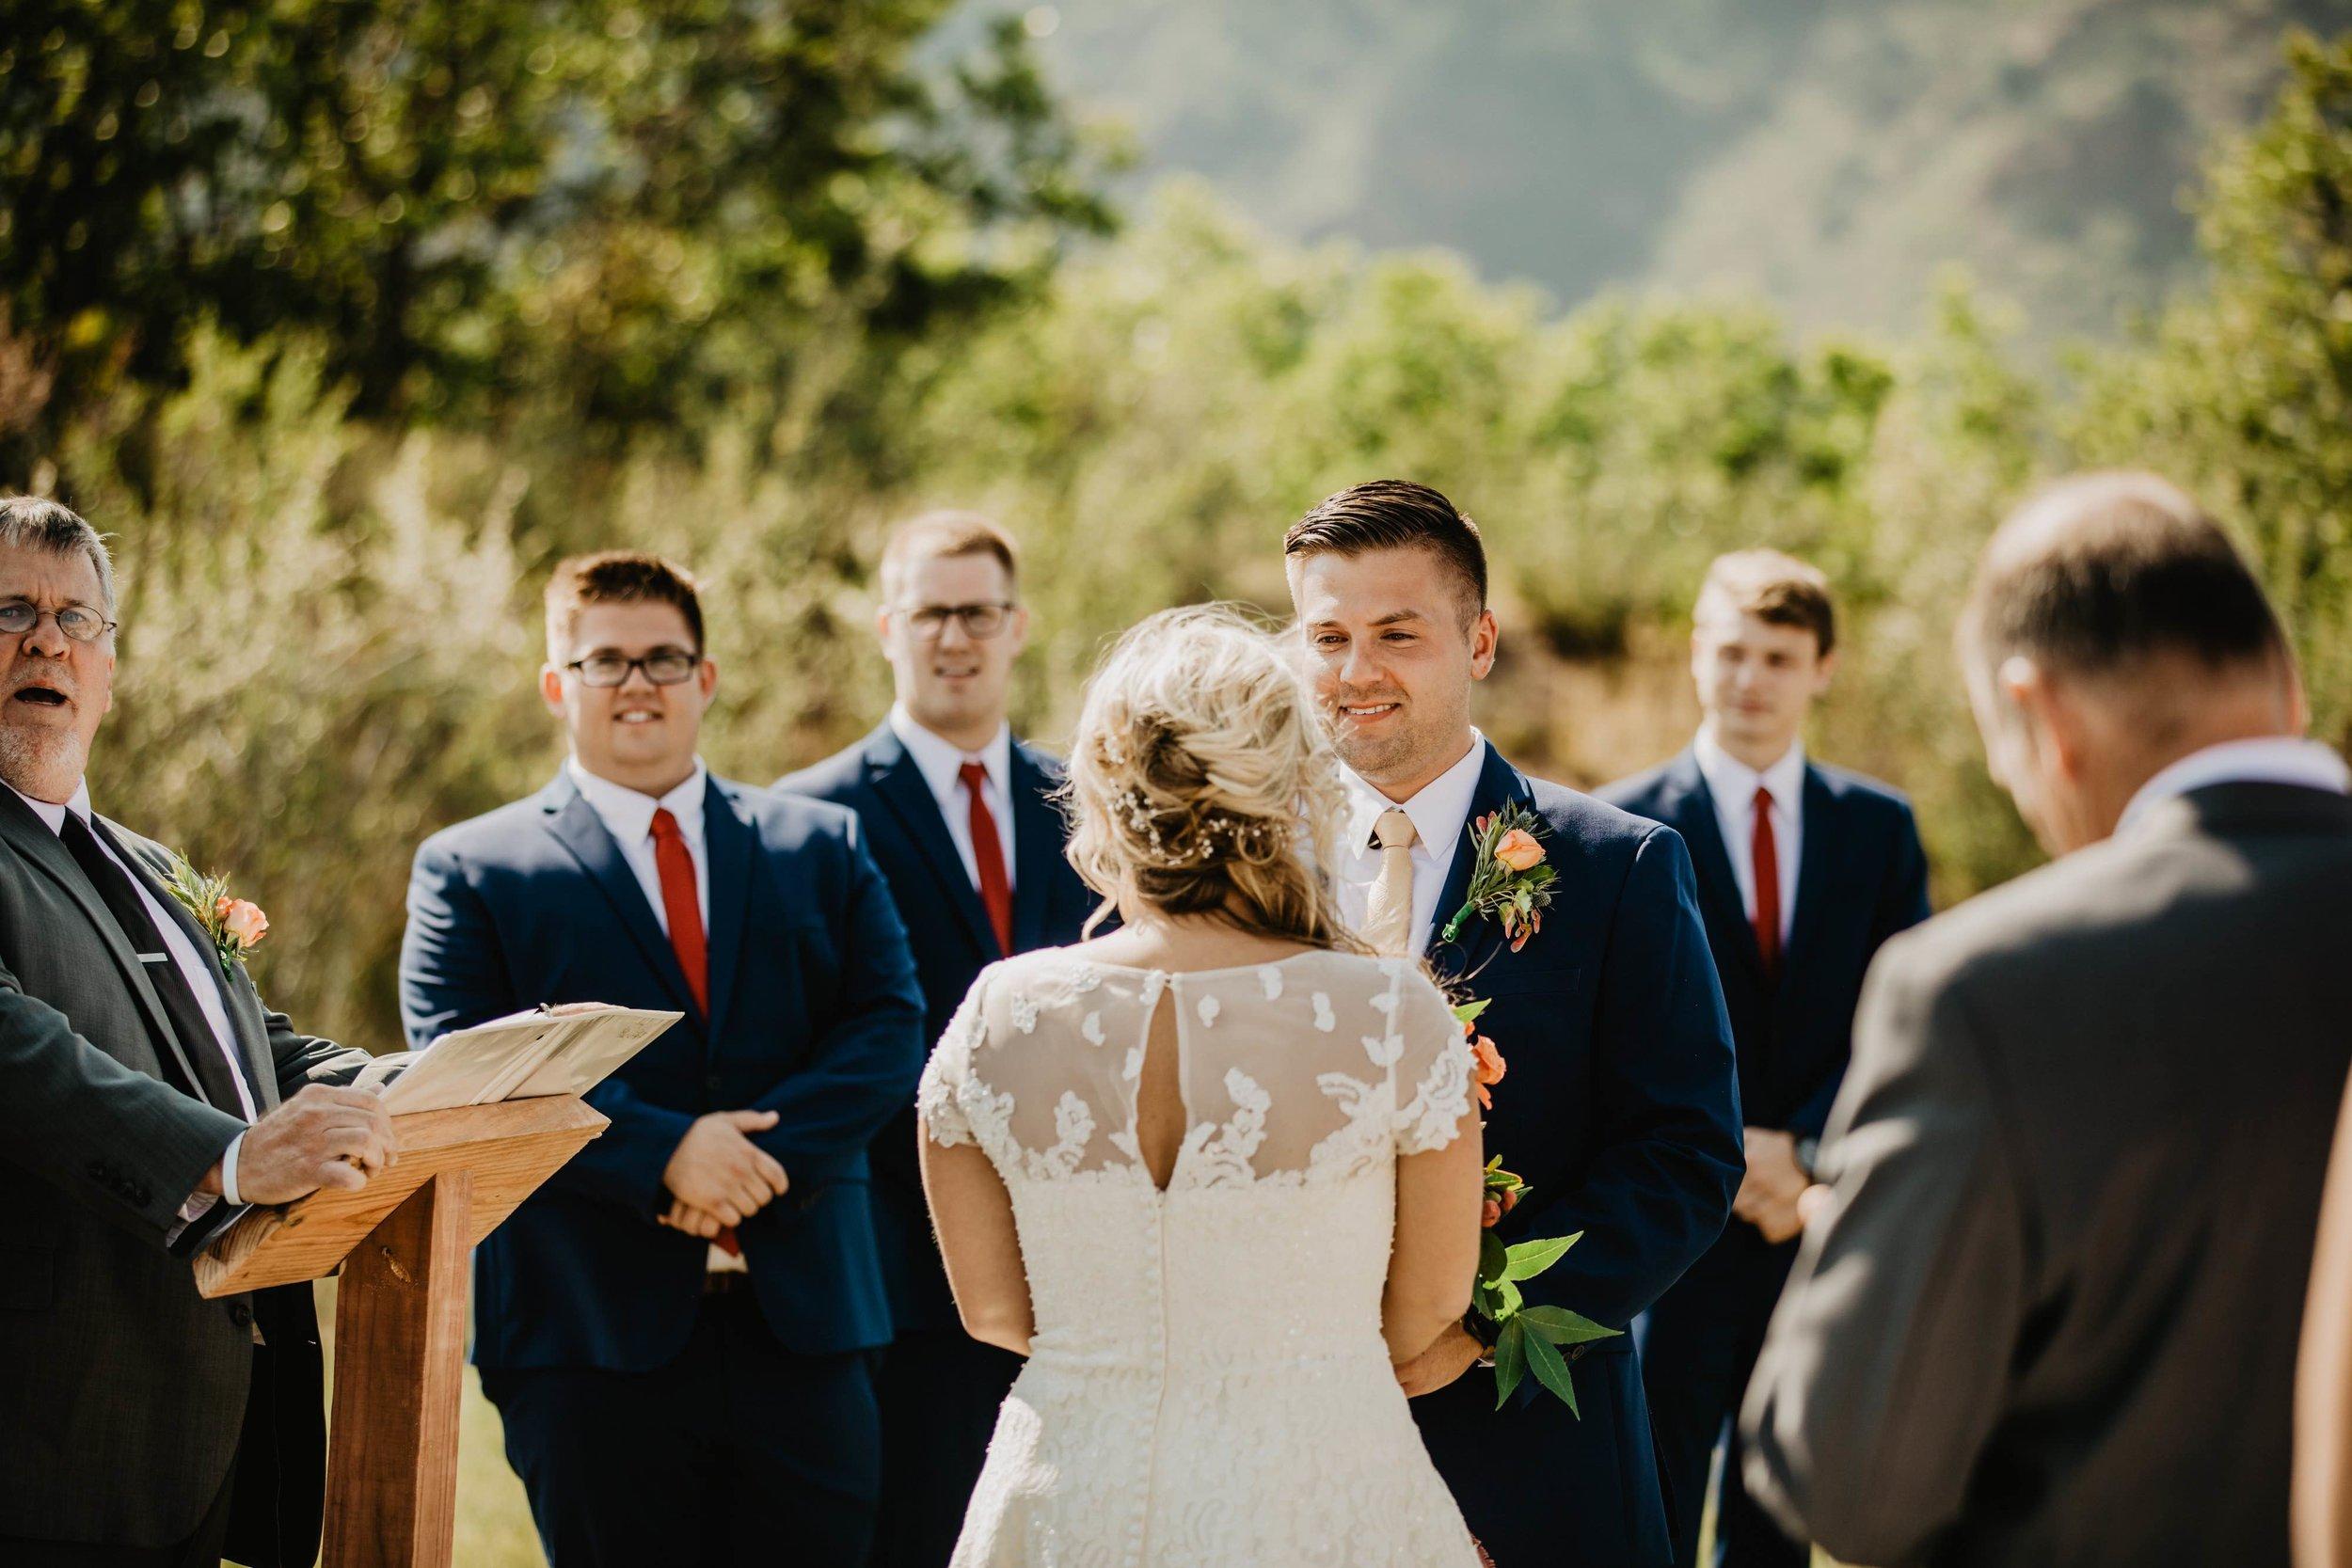 Kisa Conrad Favorites-0008-colorado-wedding-photographer-denver-springs-vail.jpeg